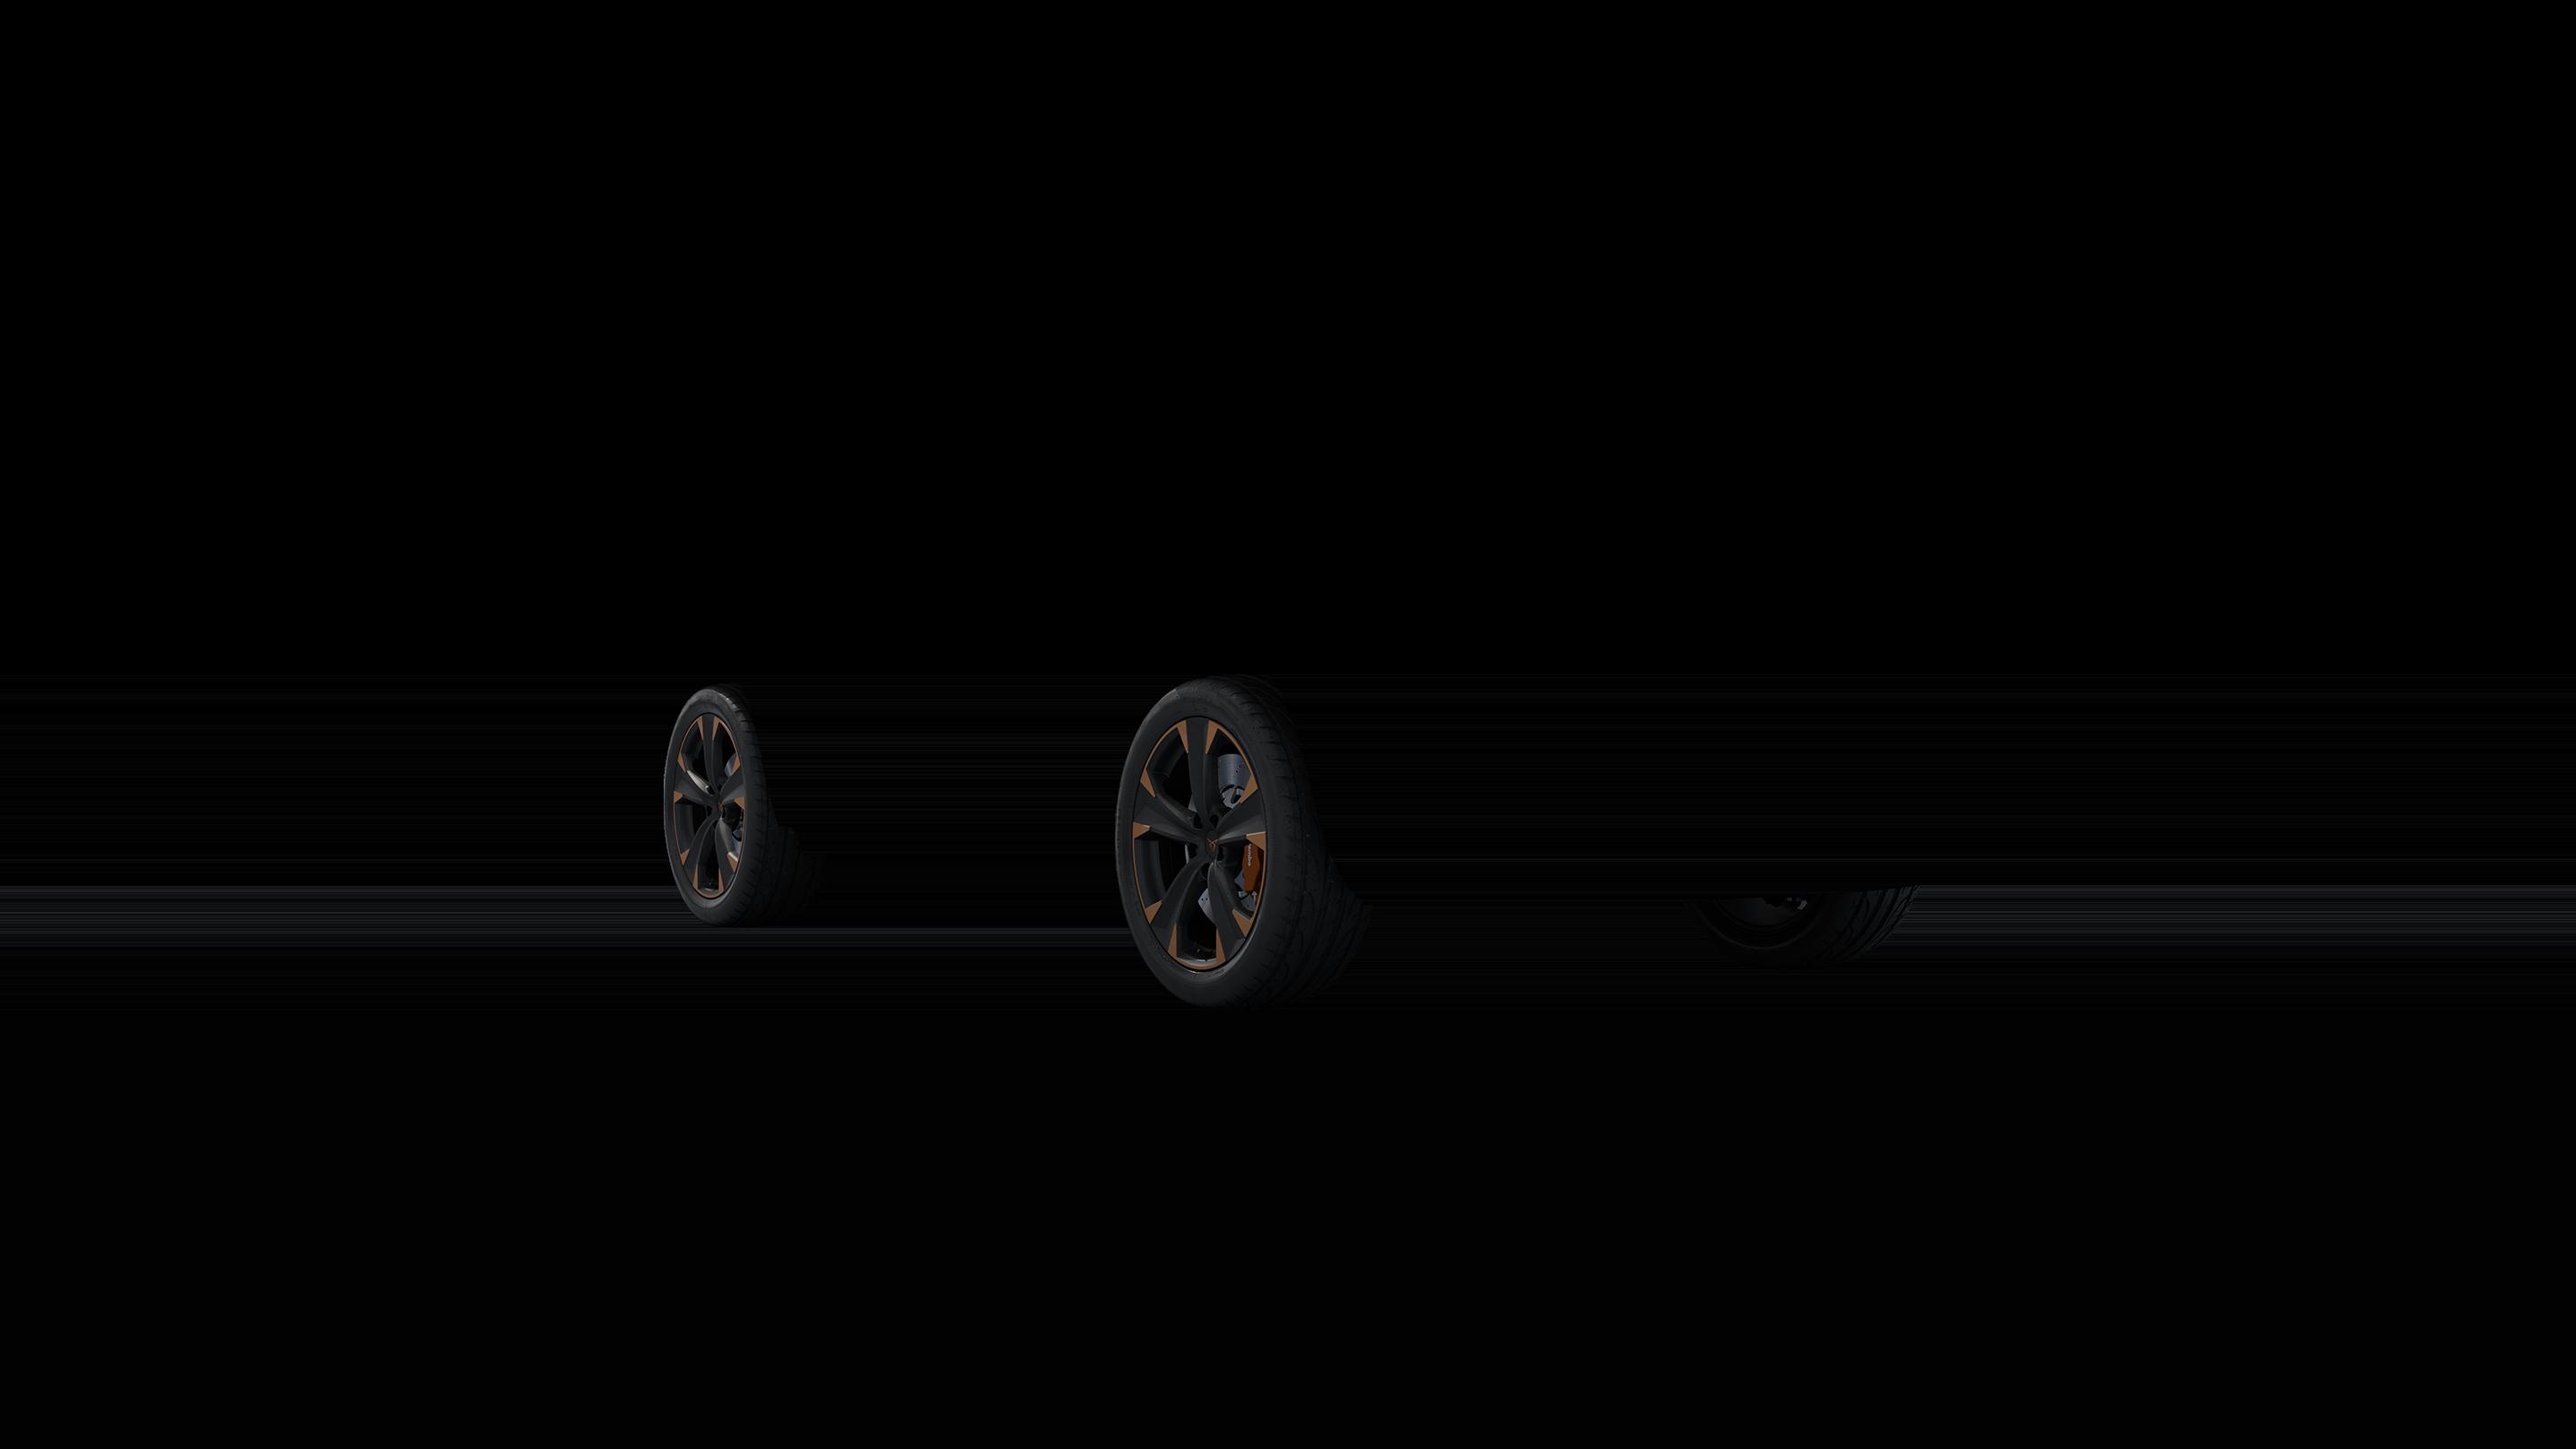 cupra-ateca-19-exclusive-alloy wheels-sport-black-and-copper